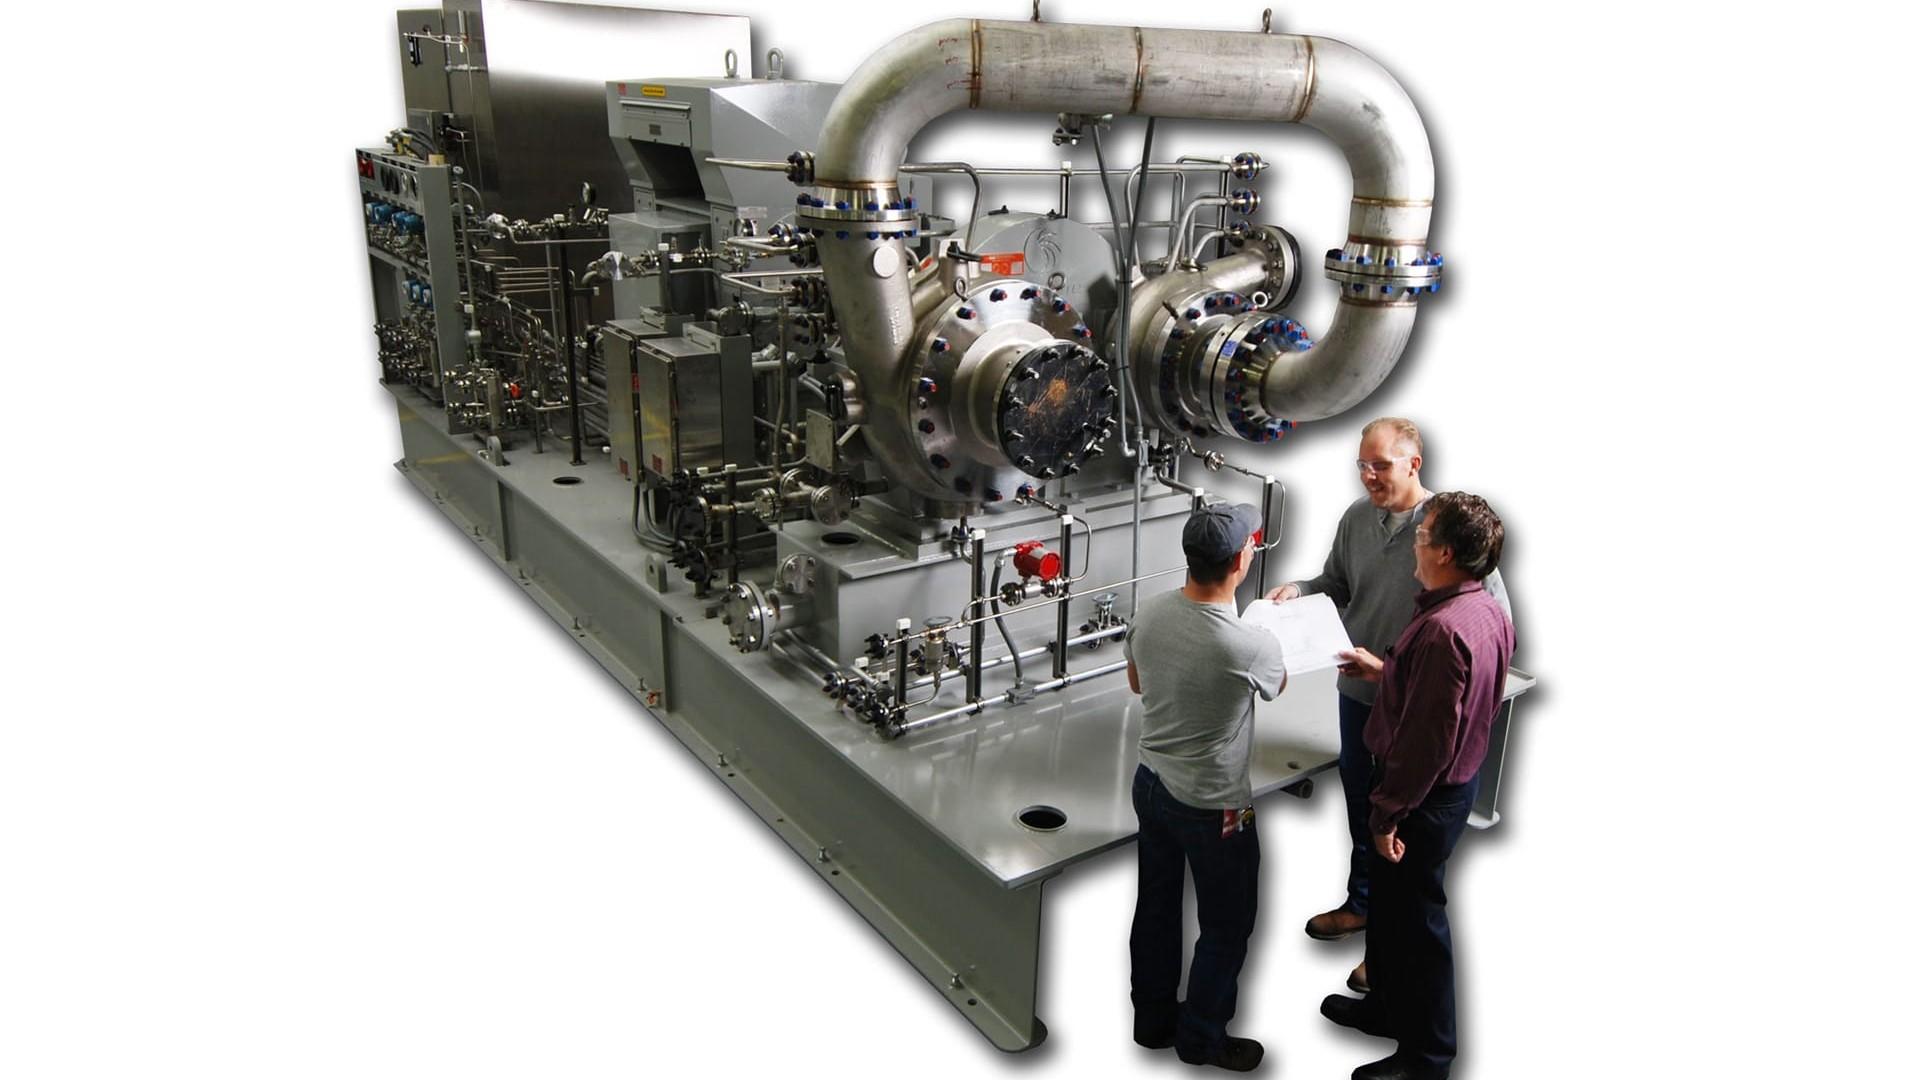 High-speed process compressors